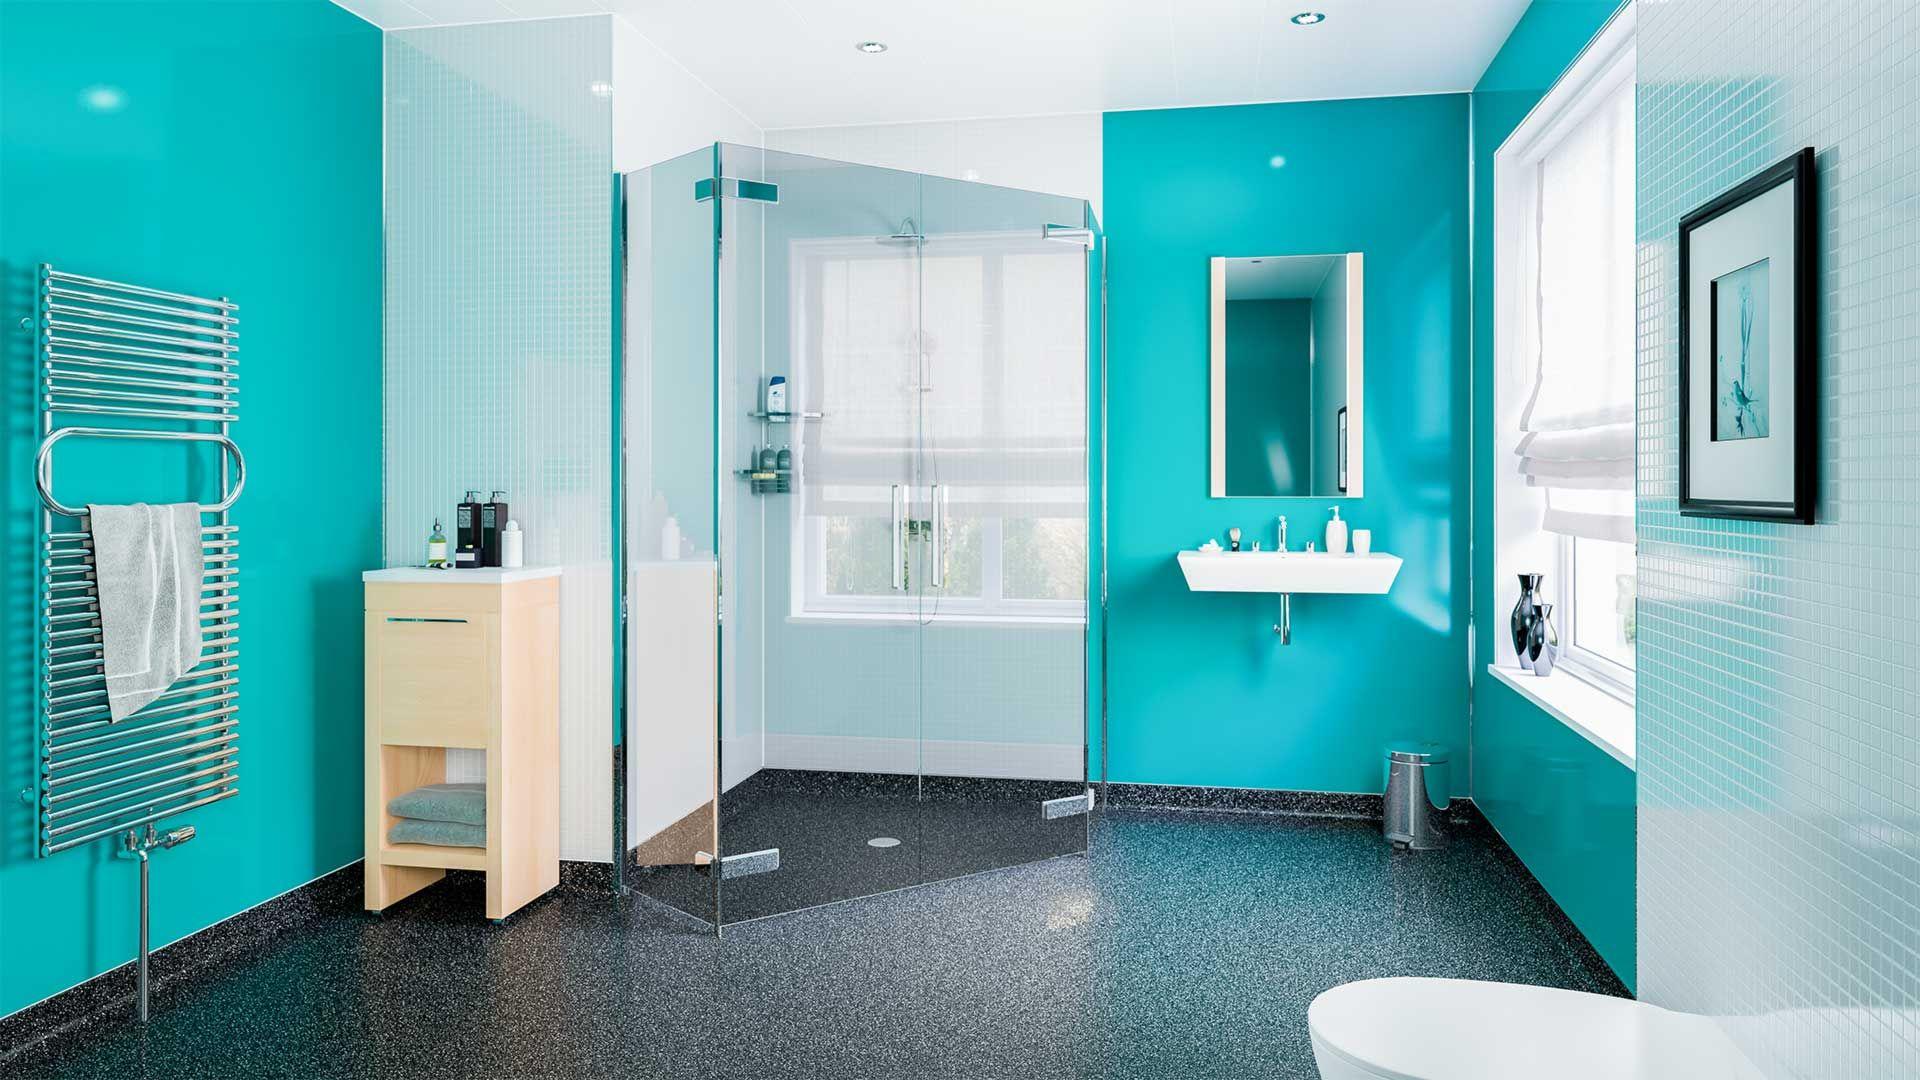 pc023 aqua green 25mm hygienic pvc wall cladding sheets